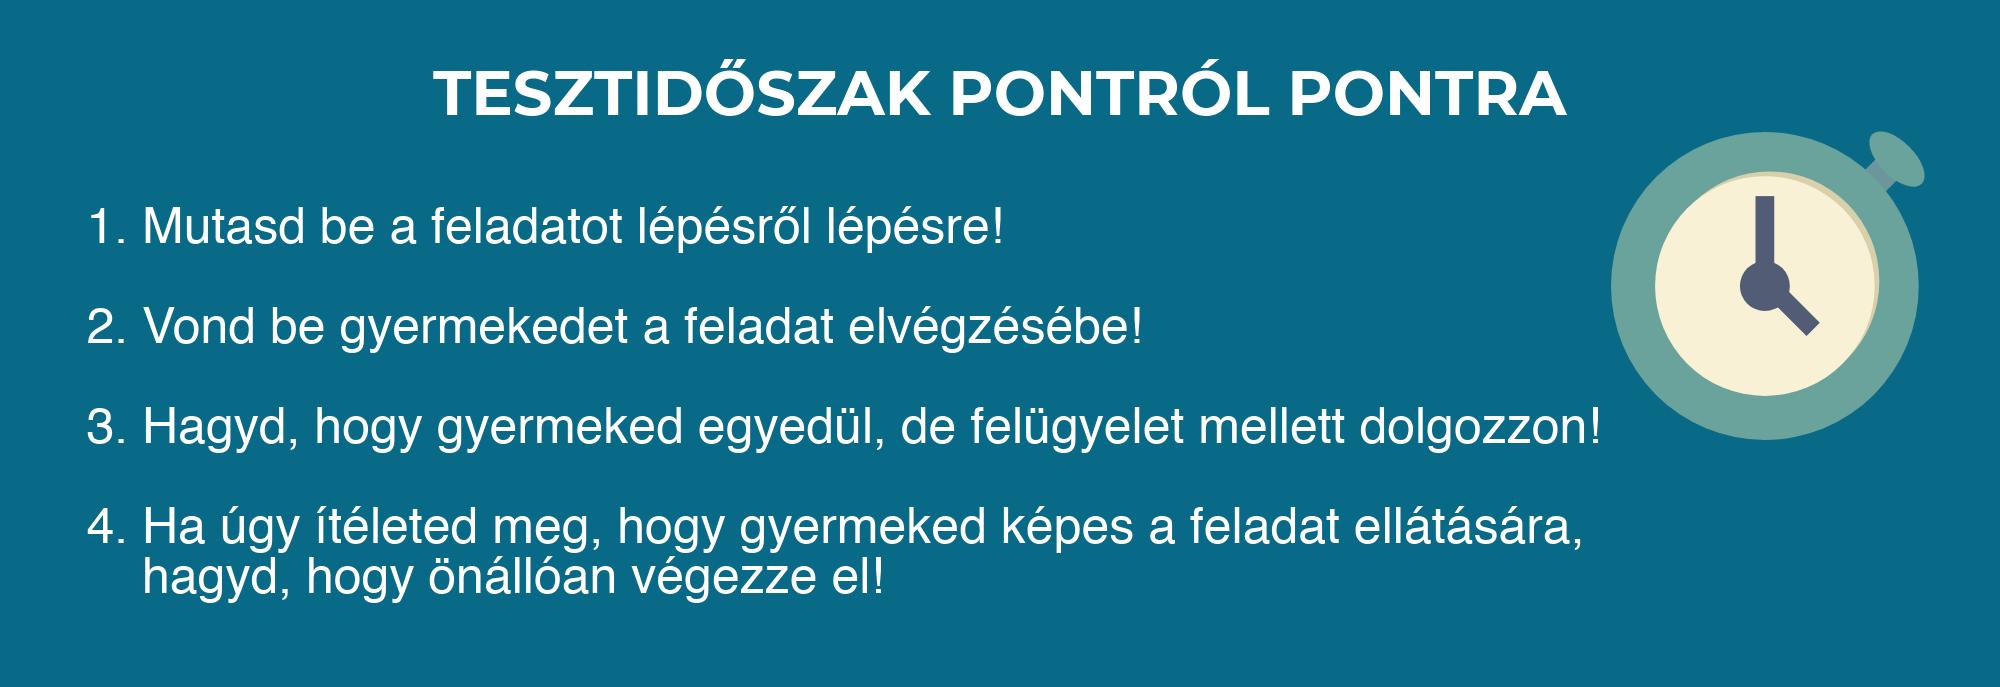 kep1.png